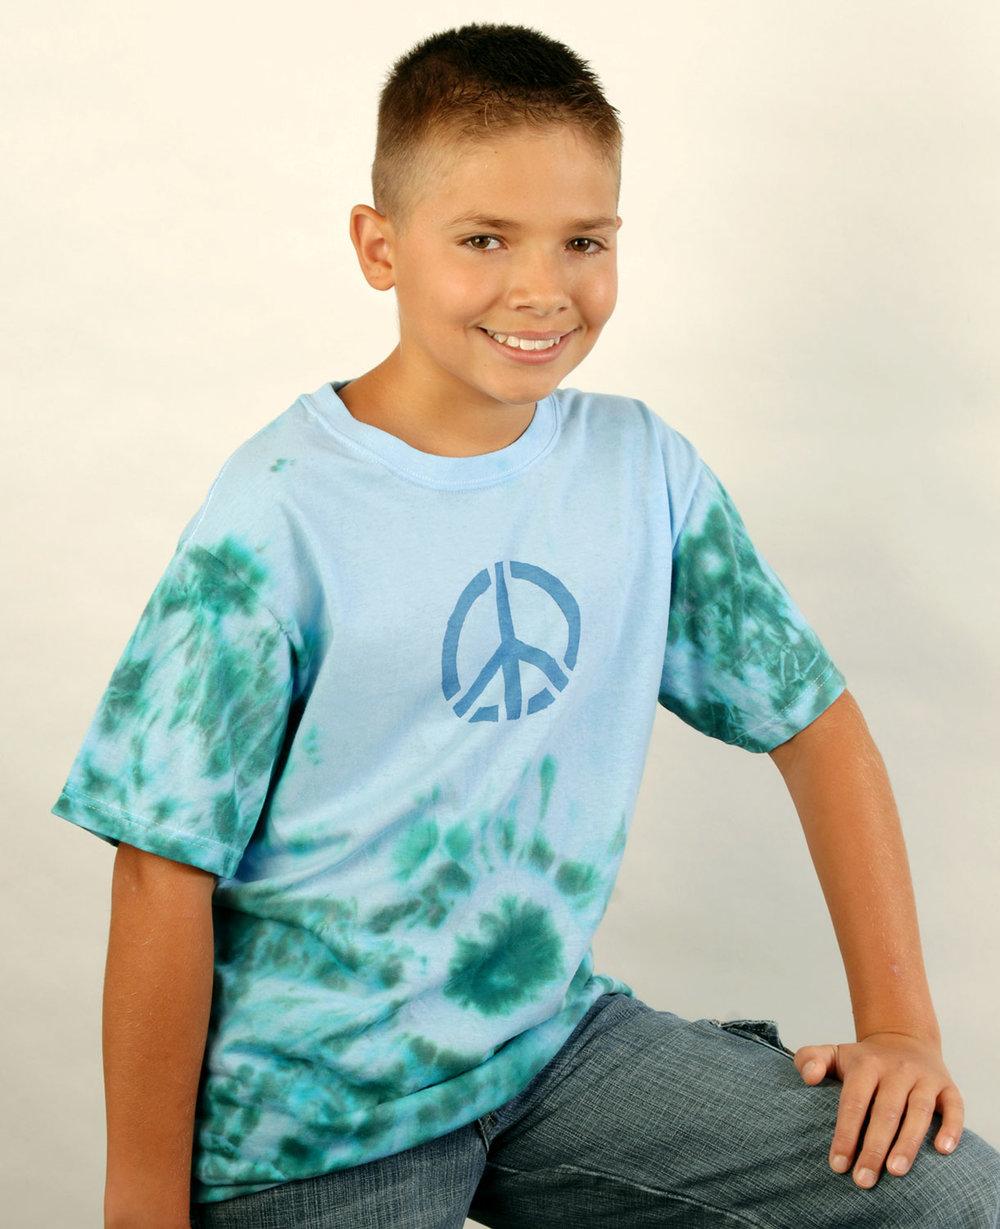 color-magnet-boy-peace-shirt.jpg